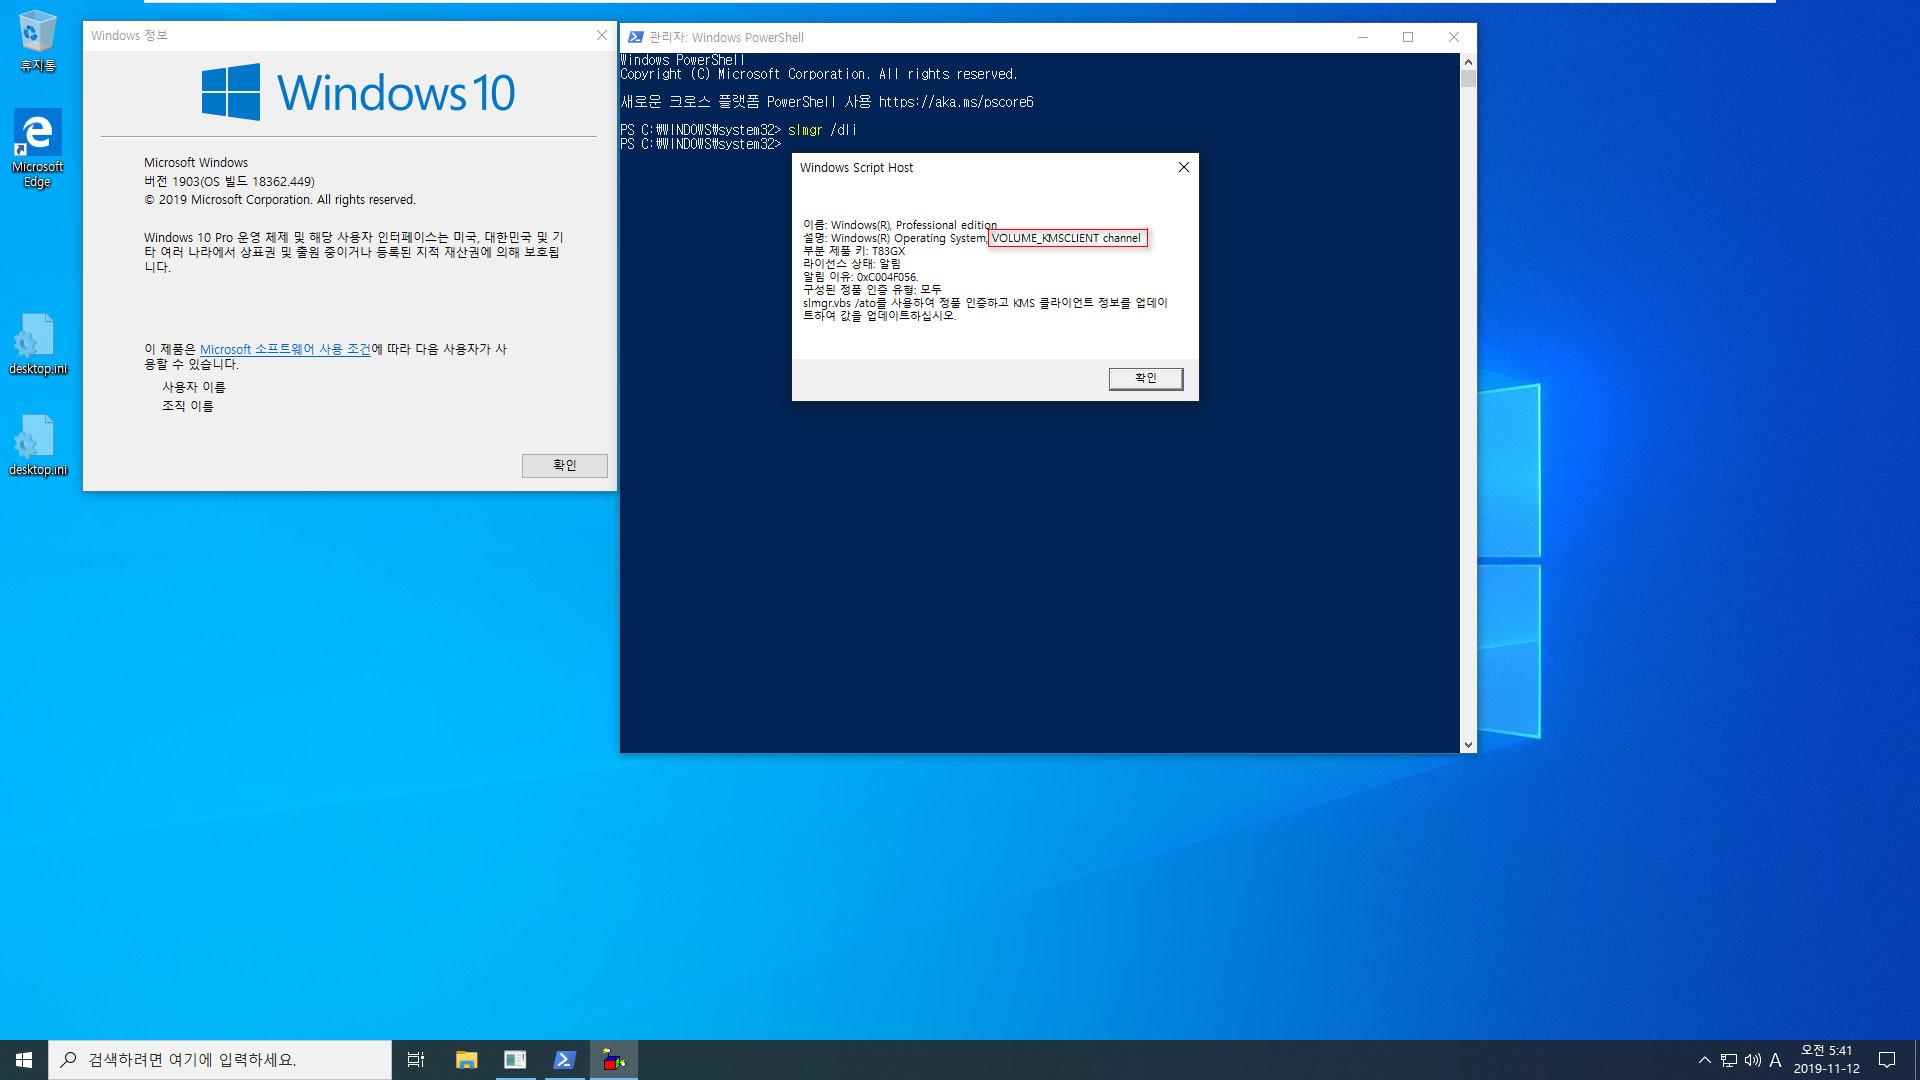 Windows 10 Enterprise LTSC [2019] (버전 1809) 를 버전 1903 프로로 업그레이드 설치하기 - 우선 설정과 앱 유지를 위해서 버전 1903 Enterprise로 업그레이드 한 후에 버전 1903 Pro로 변경하면 됩니다 2019-11-12_054109.jpg